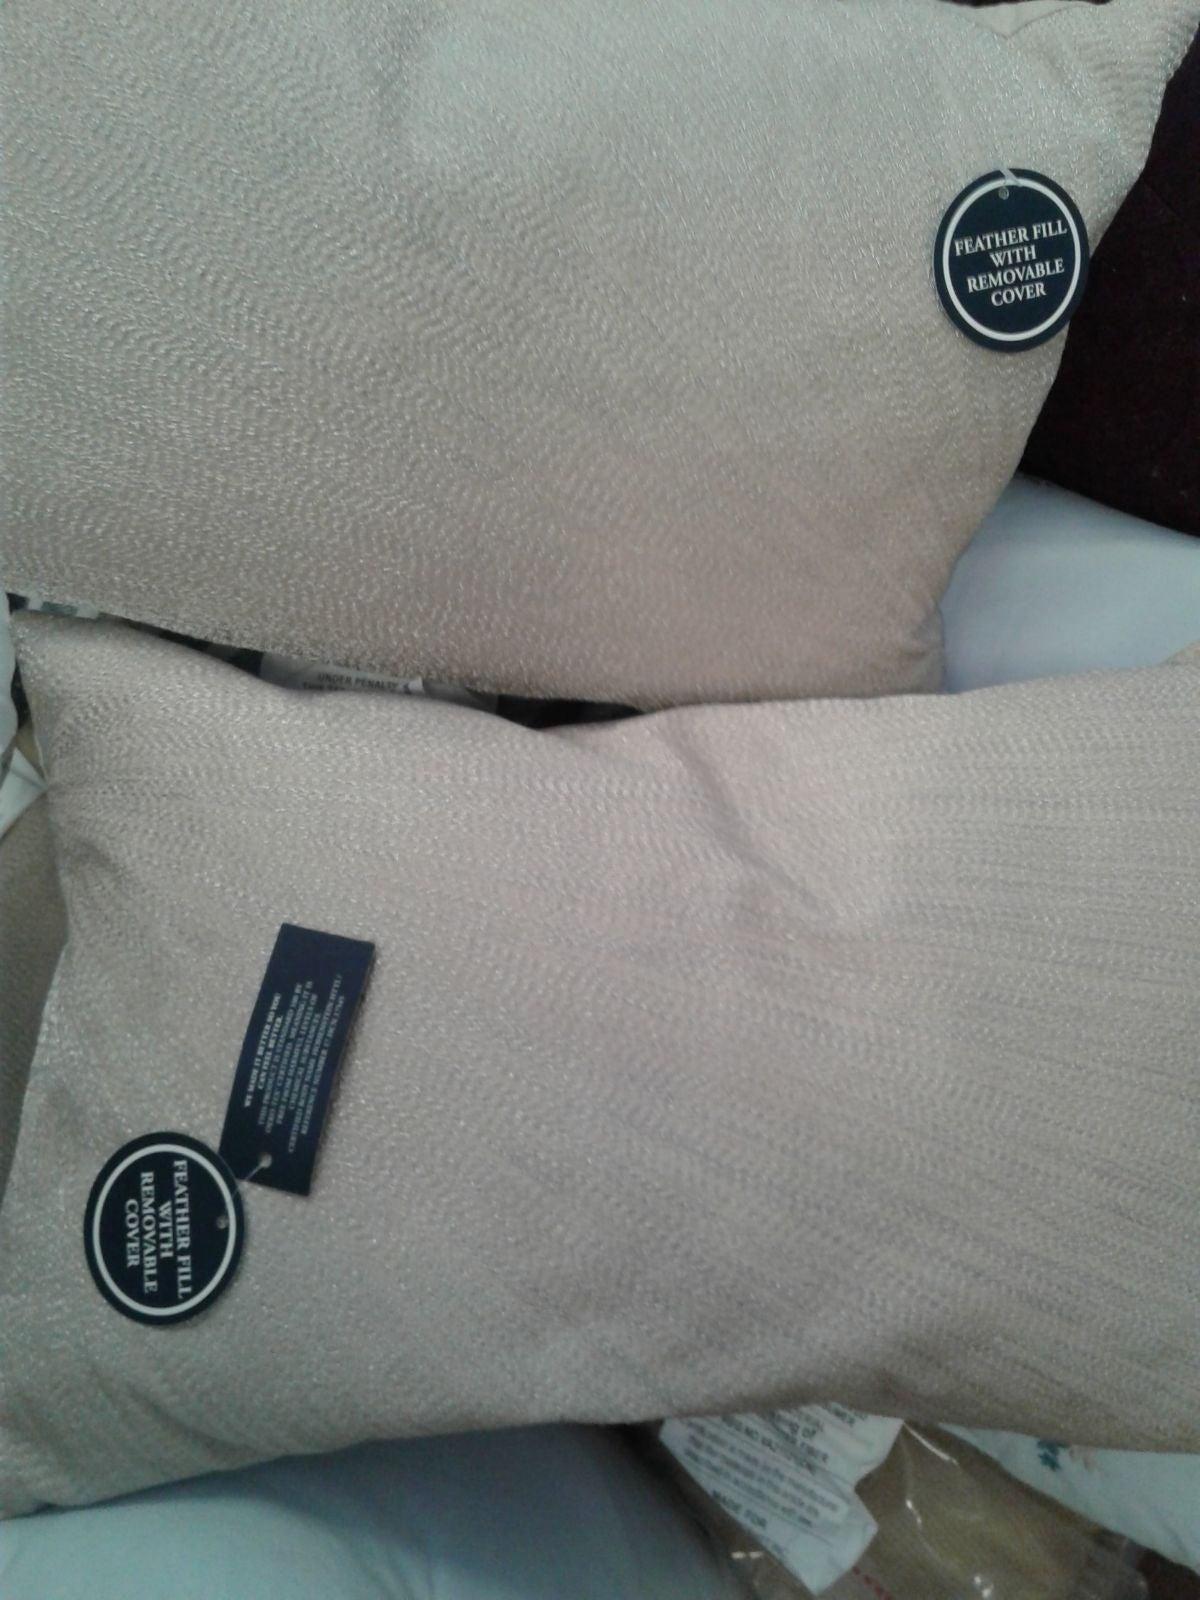 New set of throw pillows